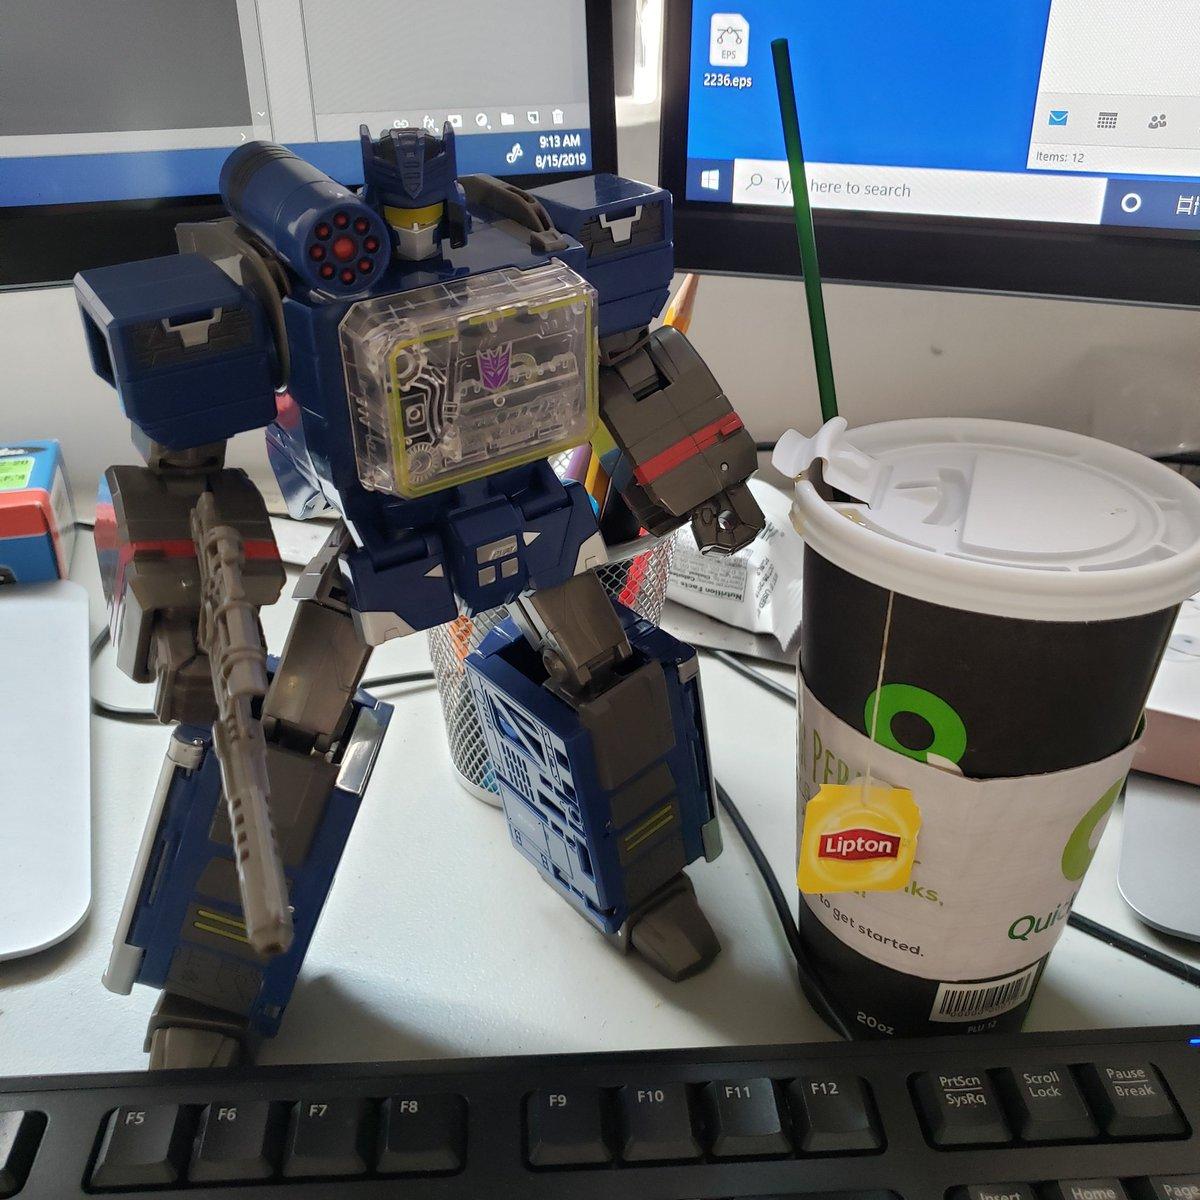 Boombox #deskbot and tea. I miss coffee..